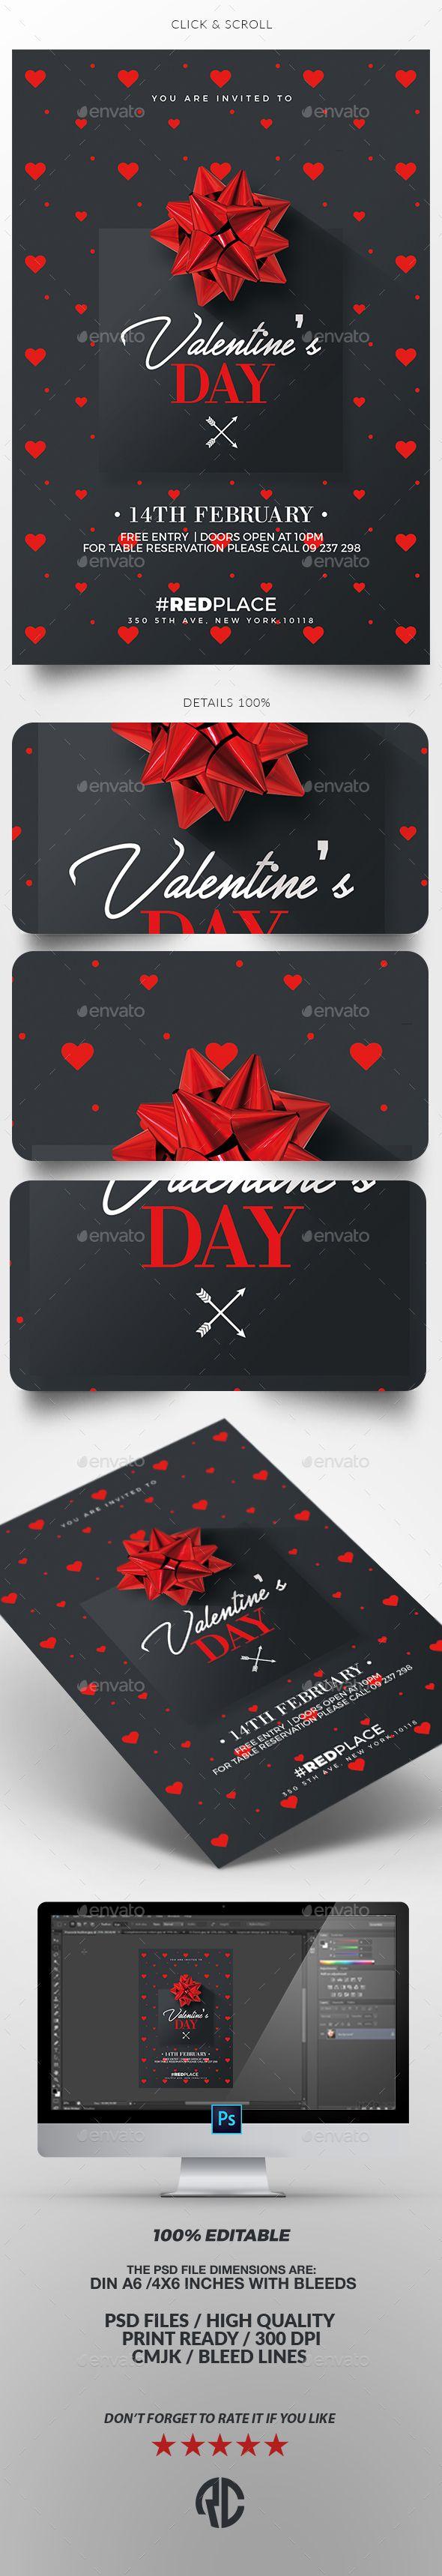 Valentines day invitation psd template card templates template valentines day invitation card template psd stopboris Choice Image